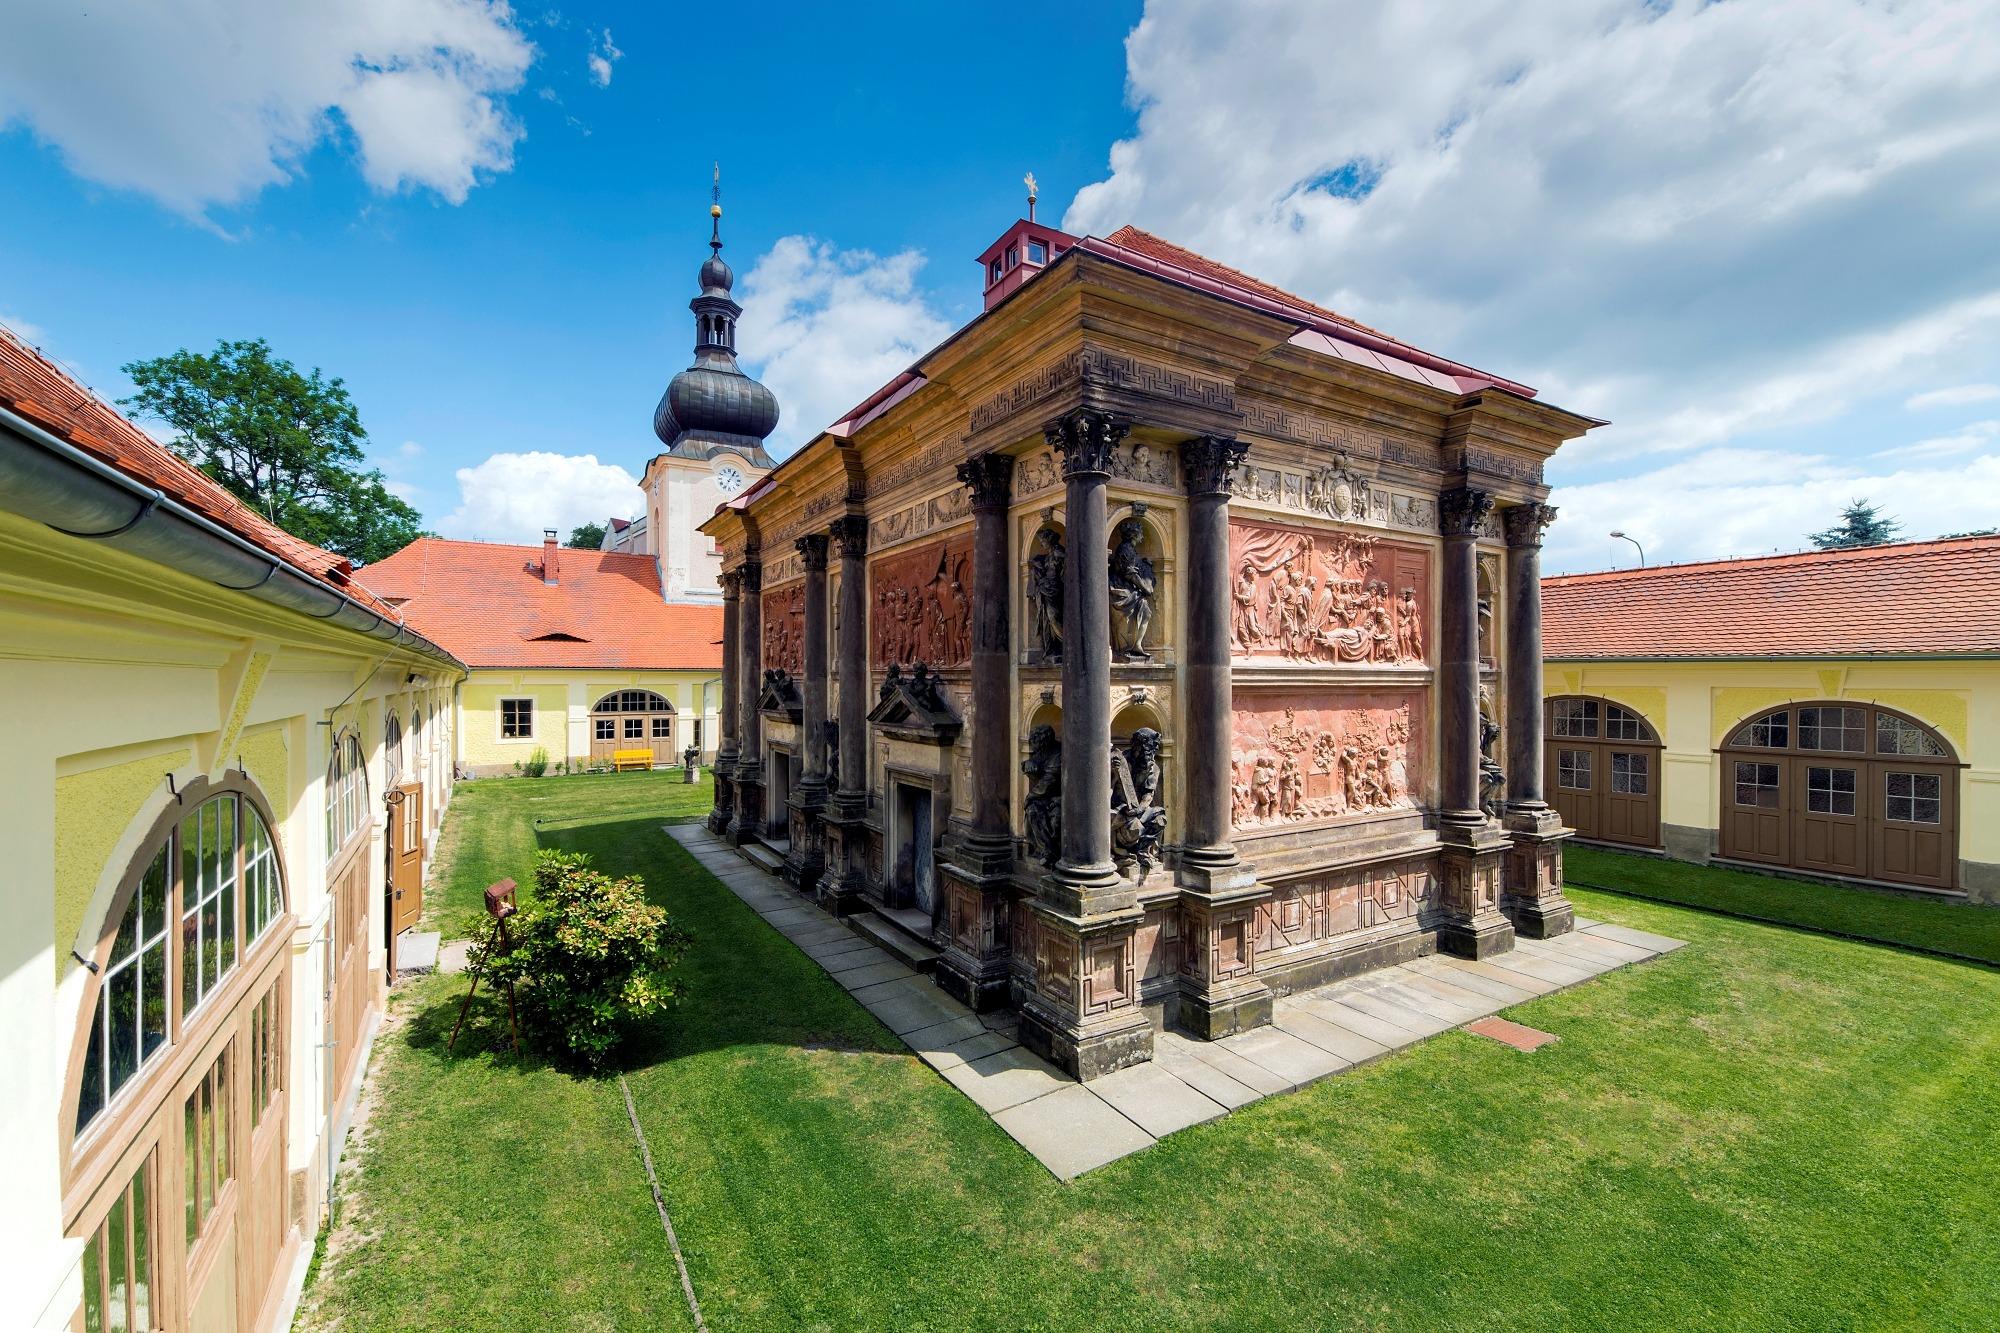 Loretánská-kaple_Loretokapelle-in-Rumburk3